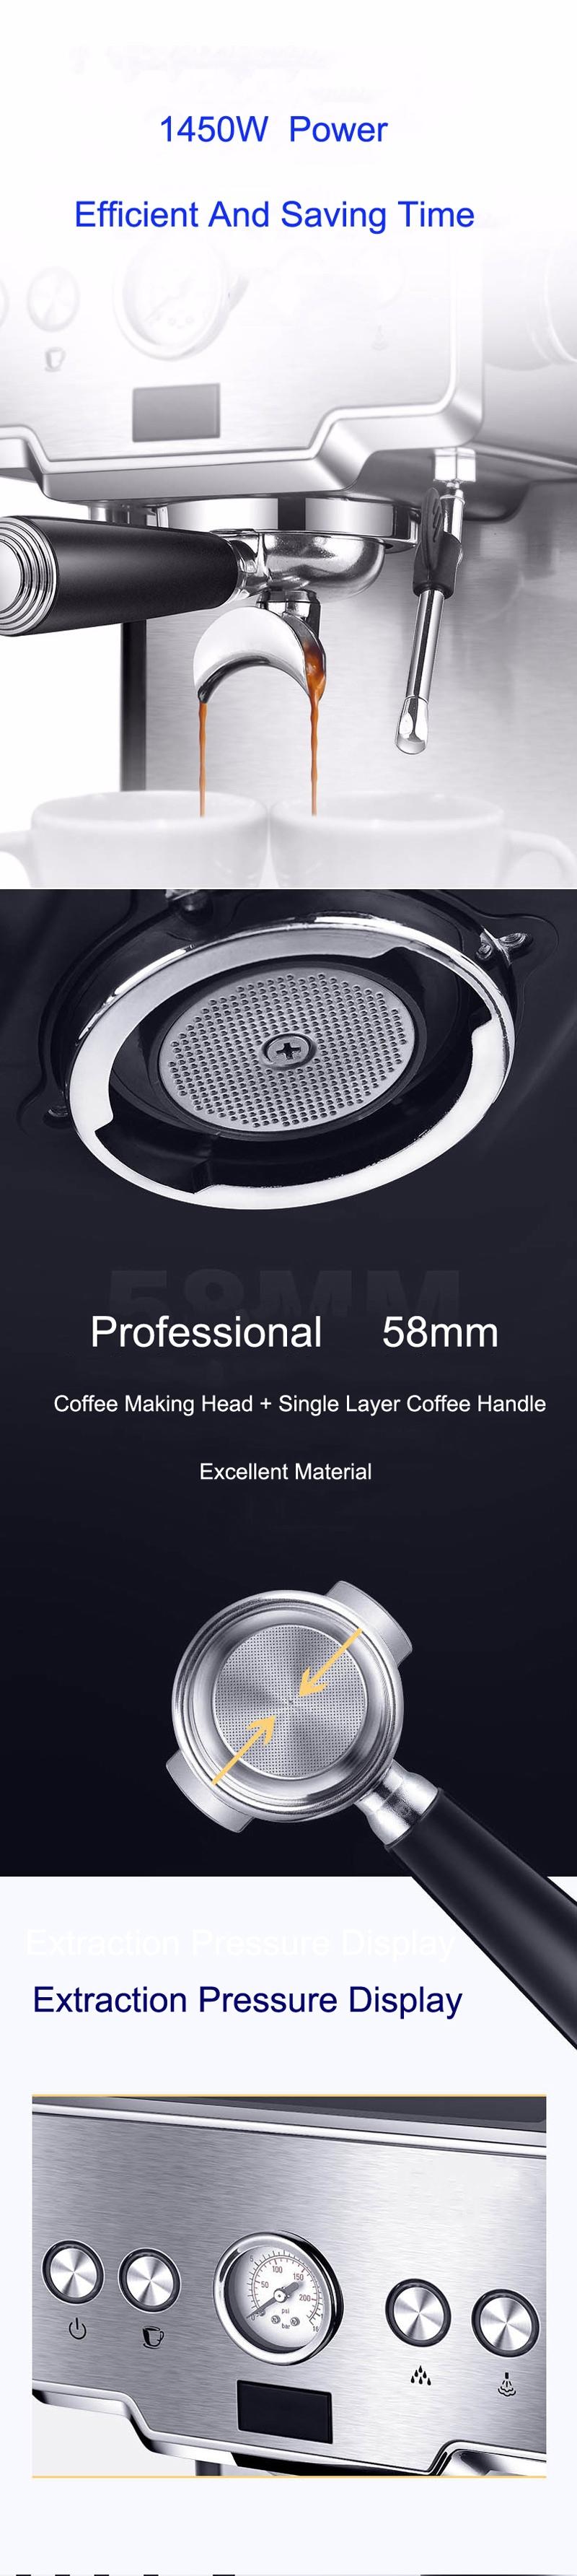 Gemilai CRM3605 kaffebryggare maskin rostfritt stål kaffemaskin 15 barer halvautomatisk kommersiell italiensk kaffebryggare